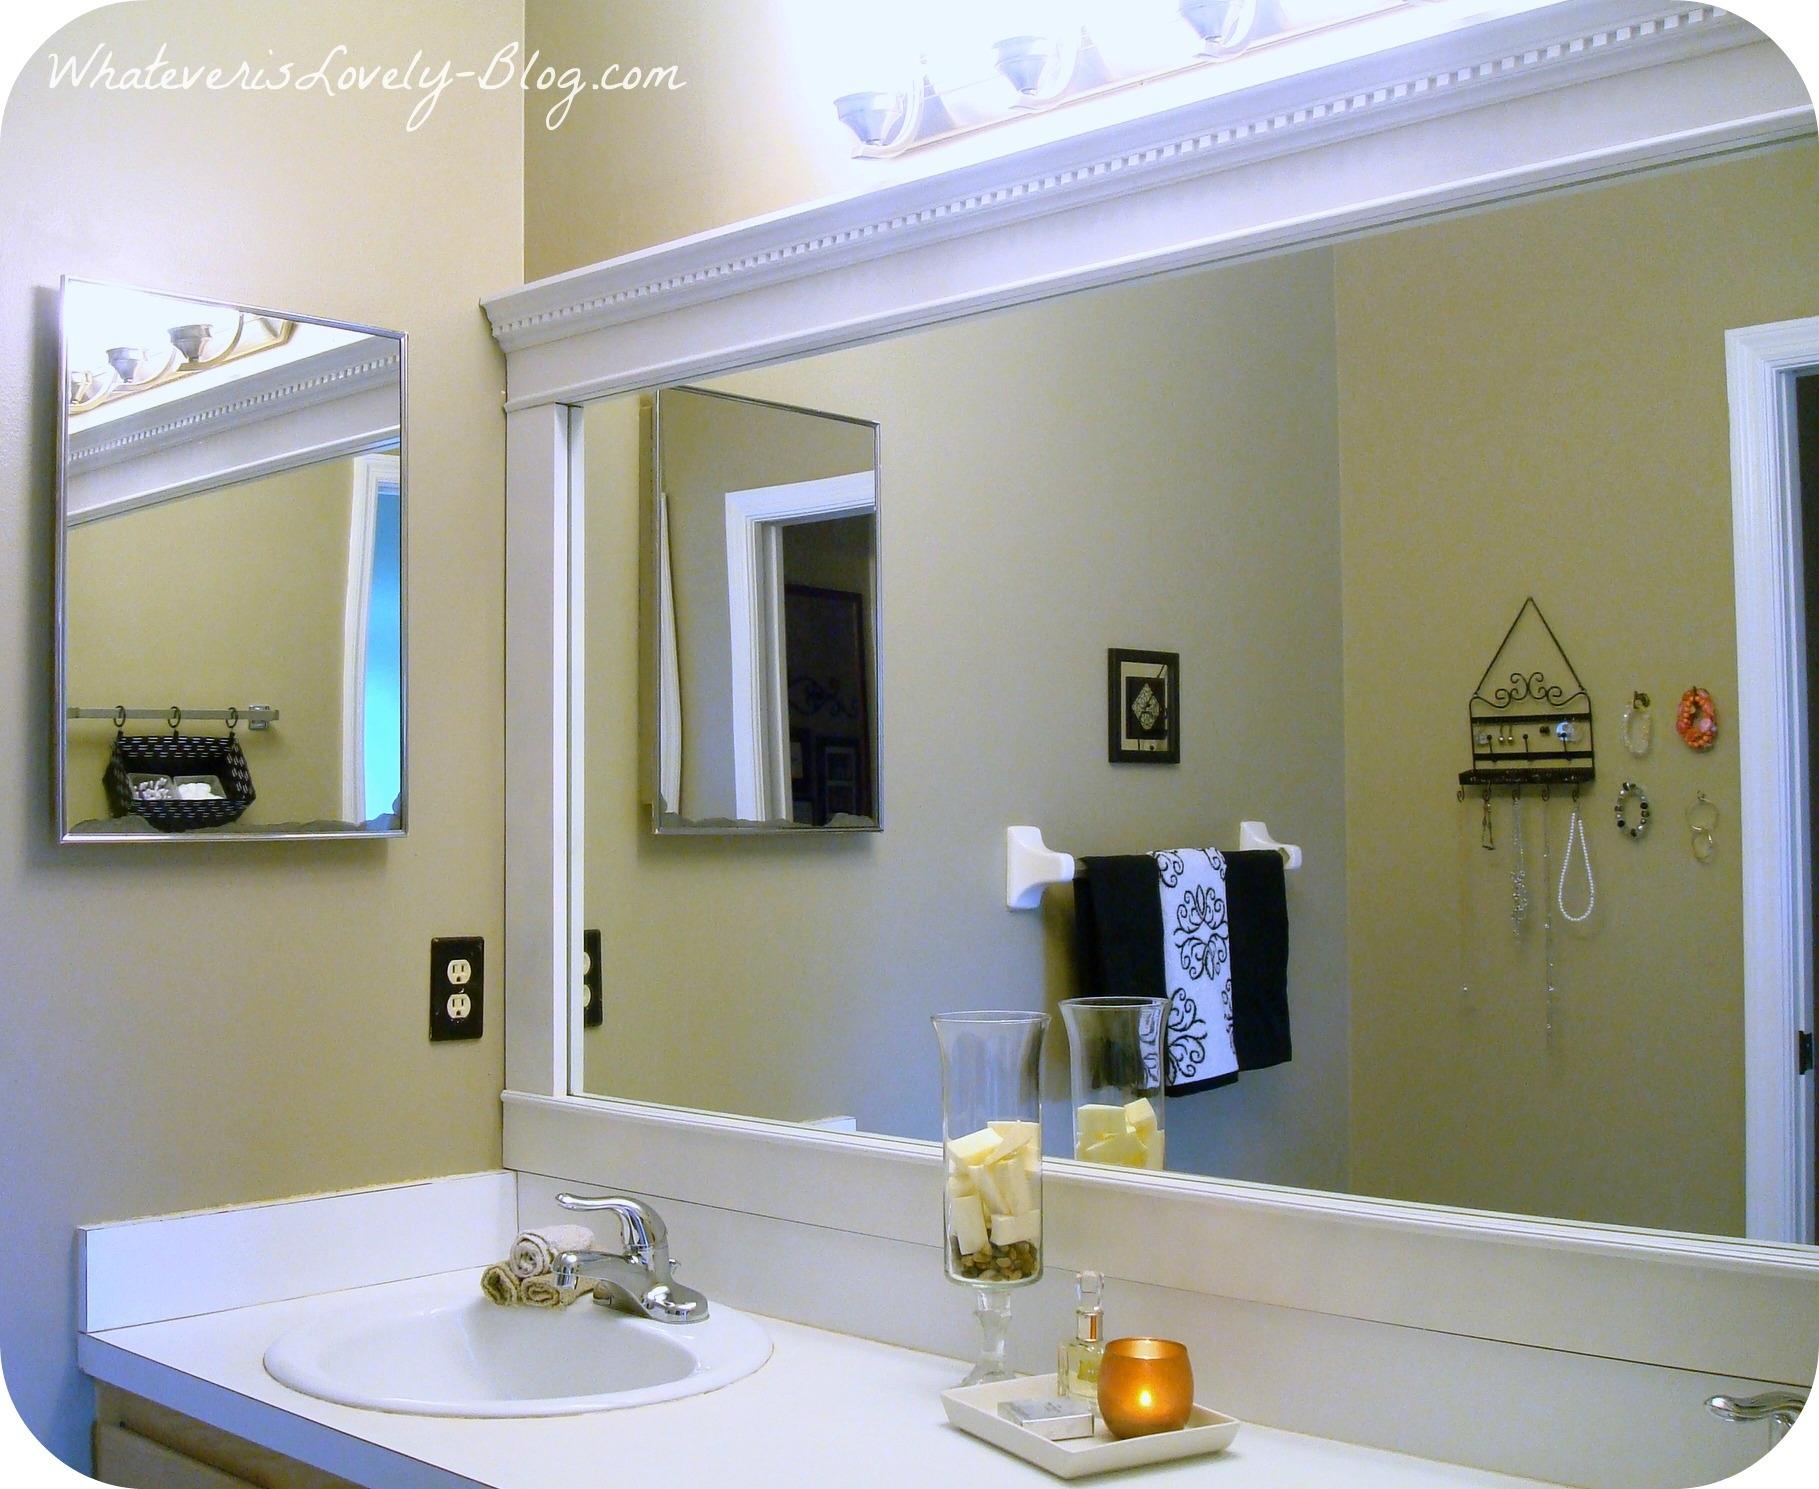 Bathroom Mirror Molding Kita reason why you shouldnt demolish your old barn just yet